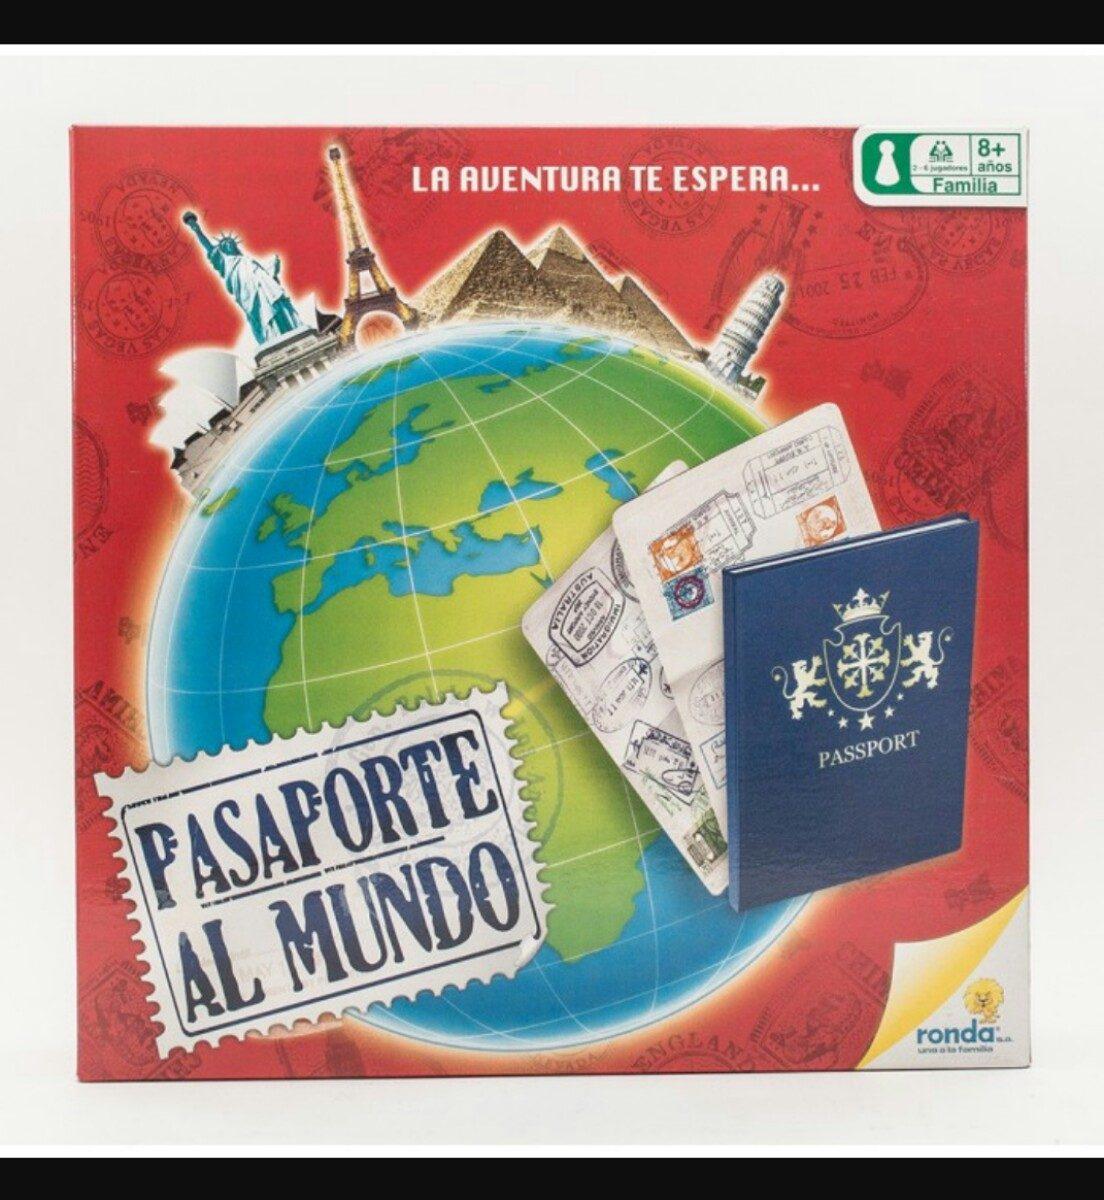 Pasaporte Al Mundo Juego De Mesa Juguete Ninos 8 Anos Bs 0 20 En